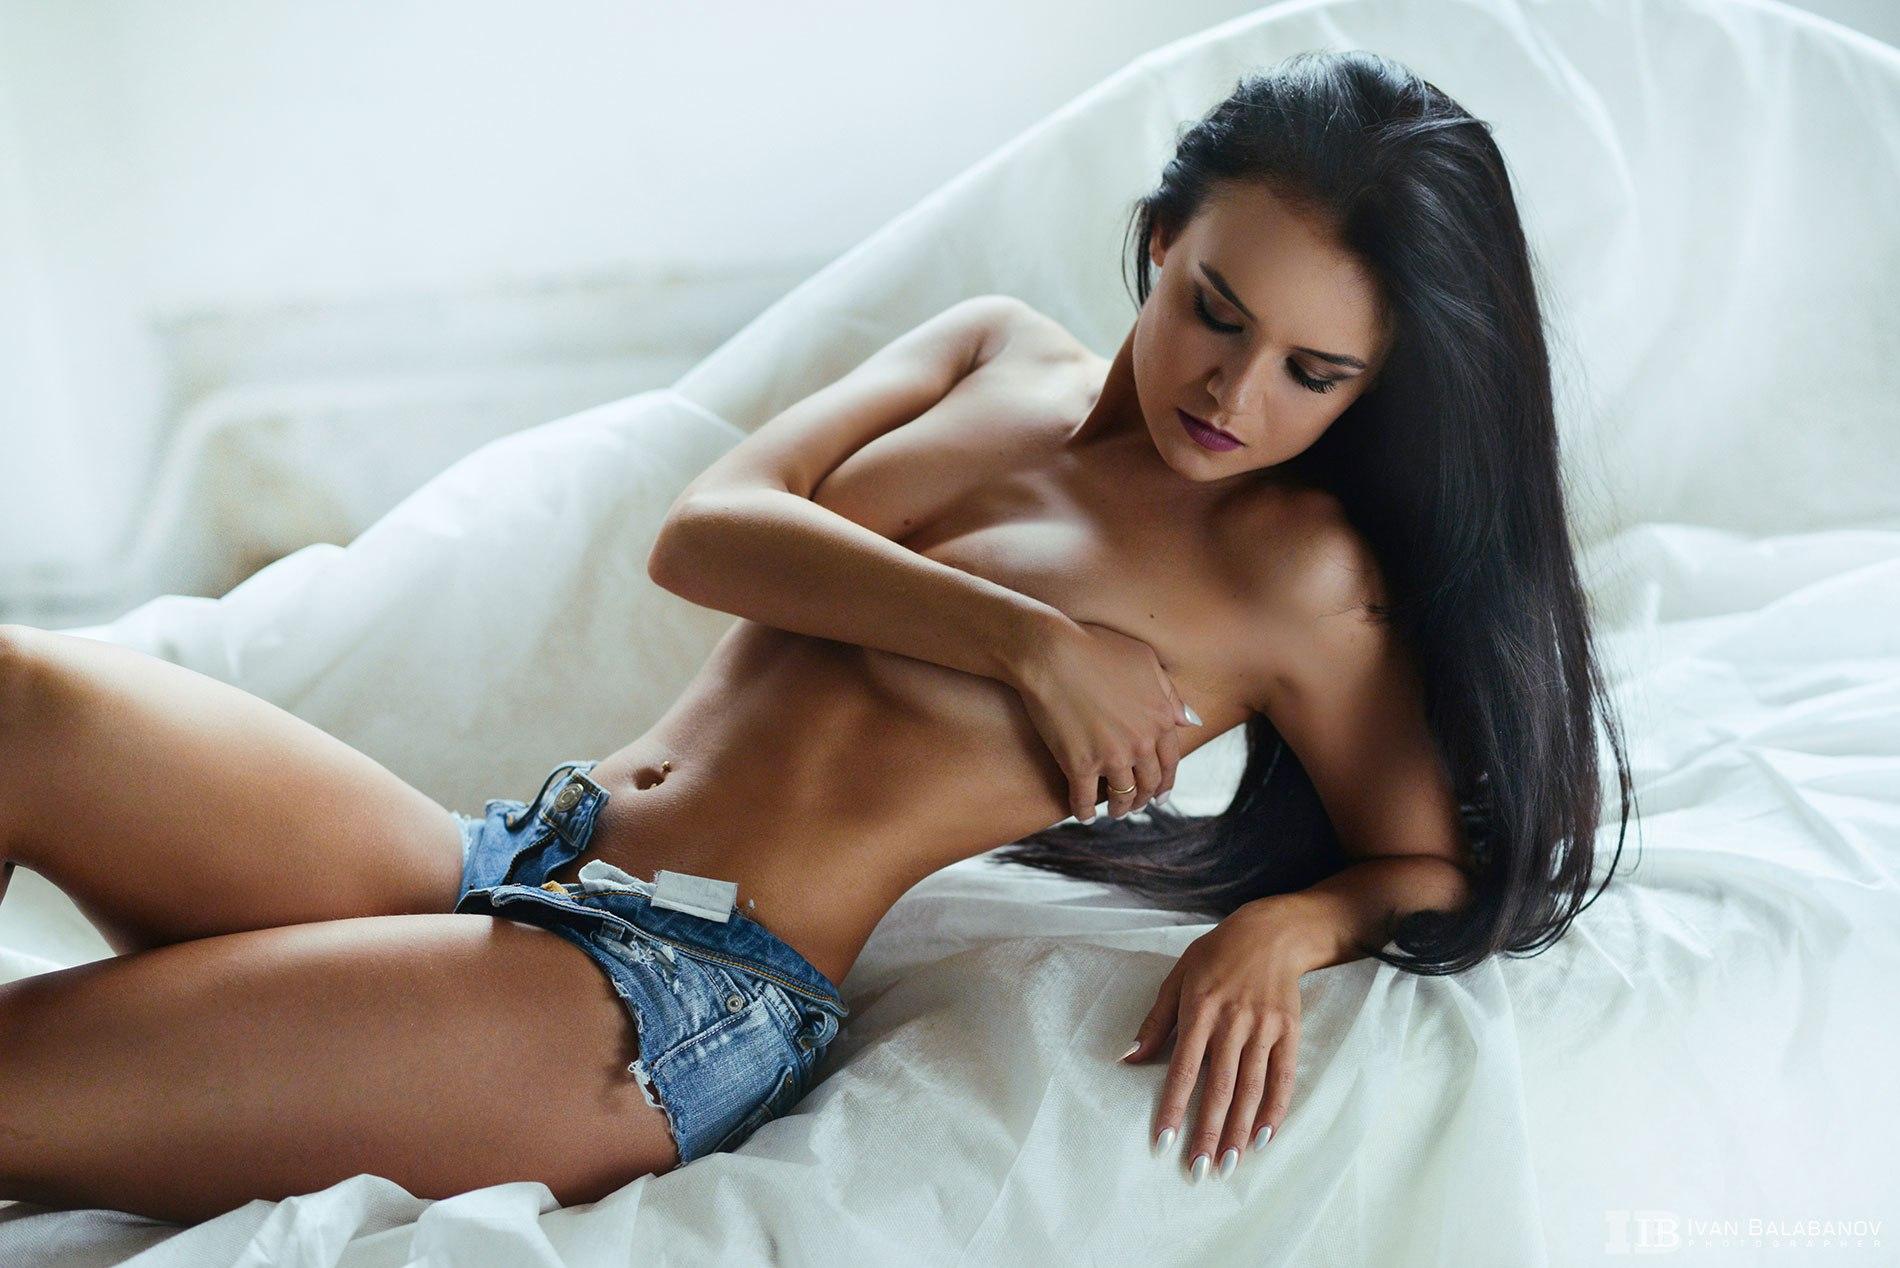 Big dildo insertion in stockings tmb